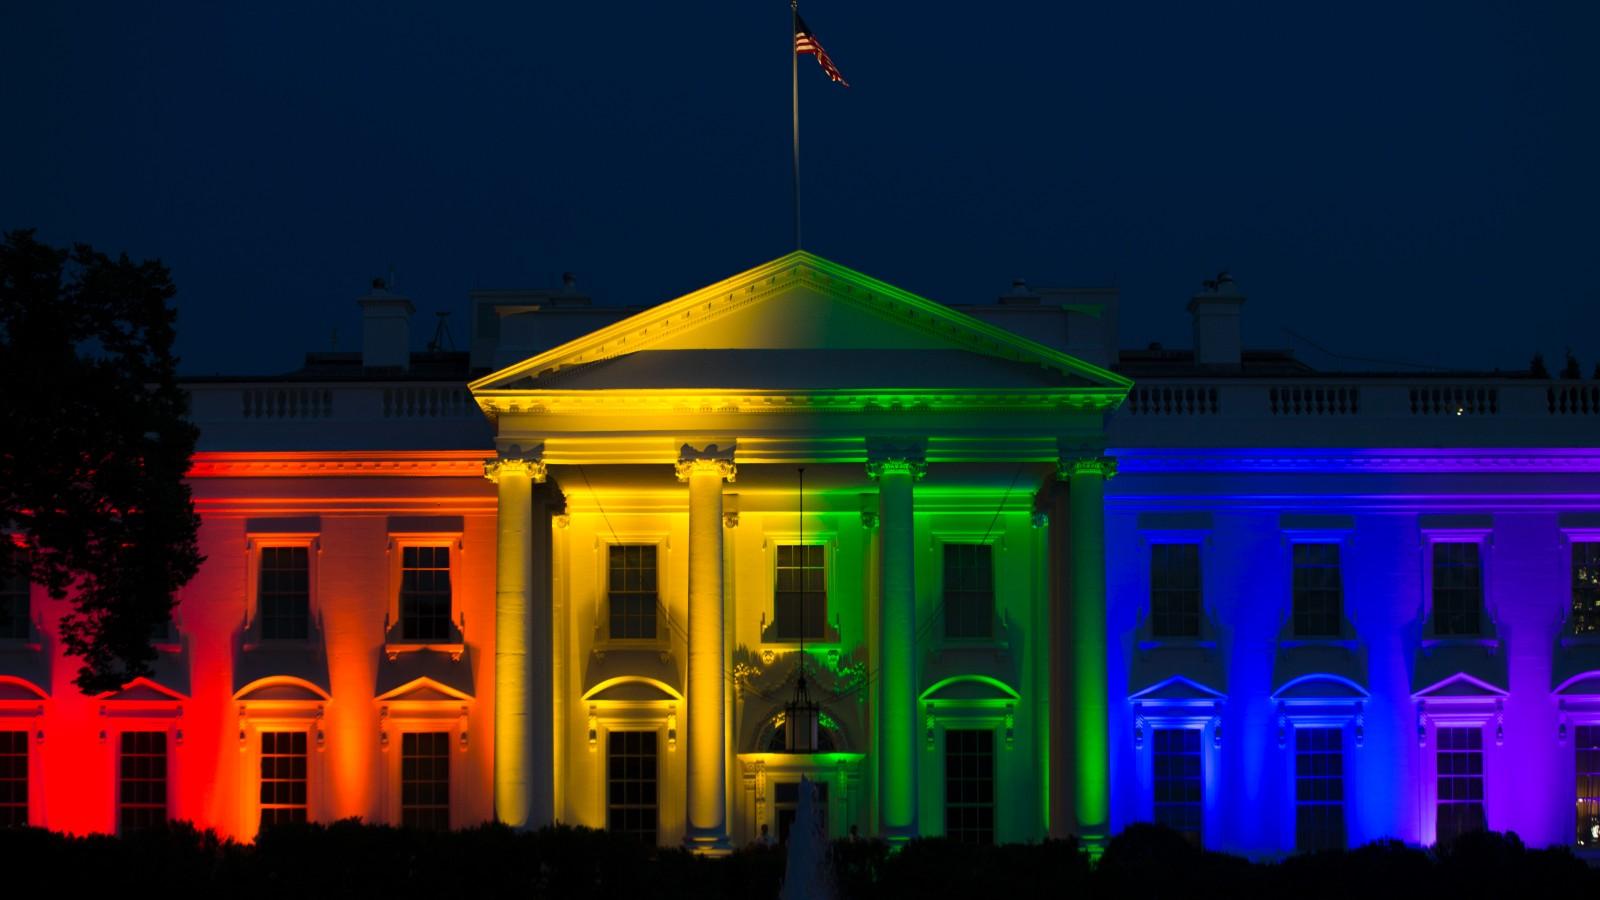 White House lights with rainbow colors - CNNPolitics